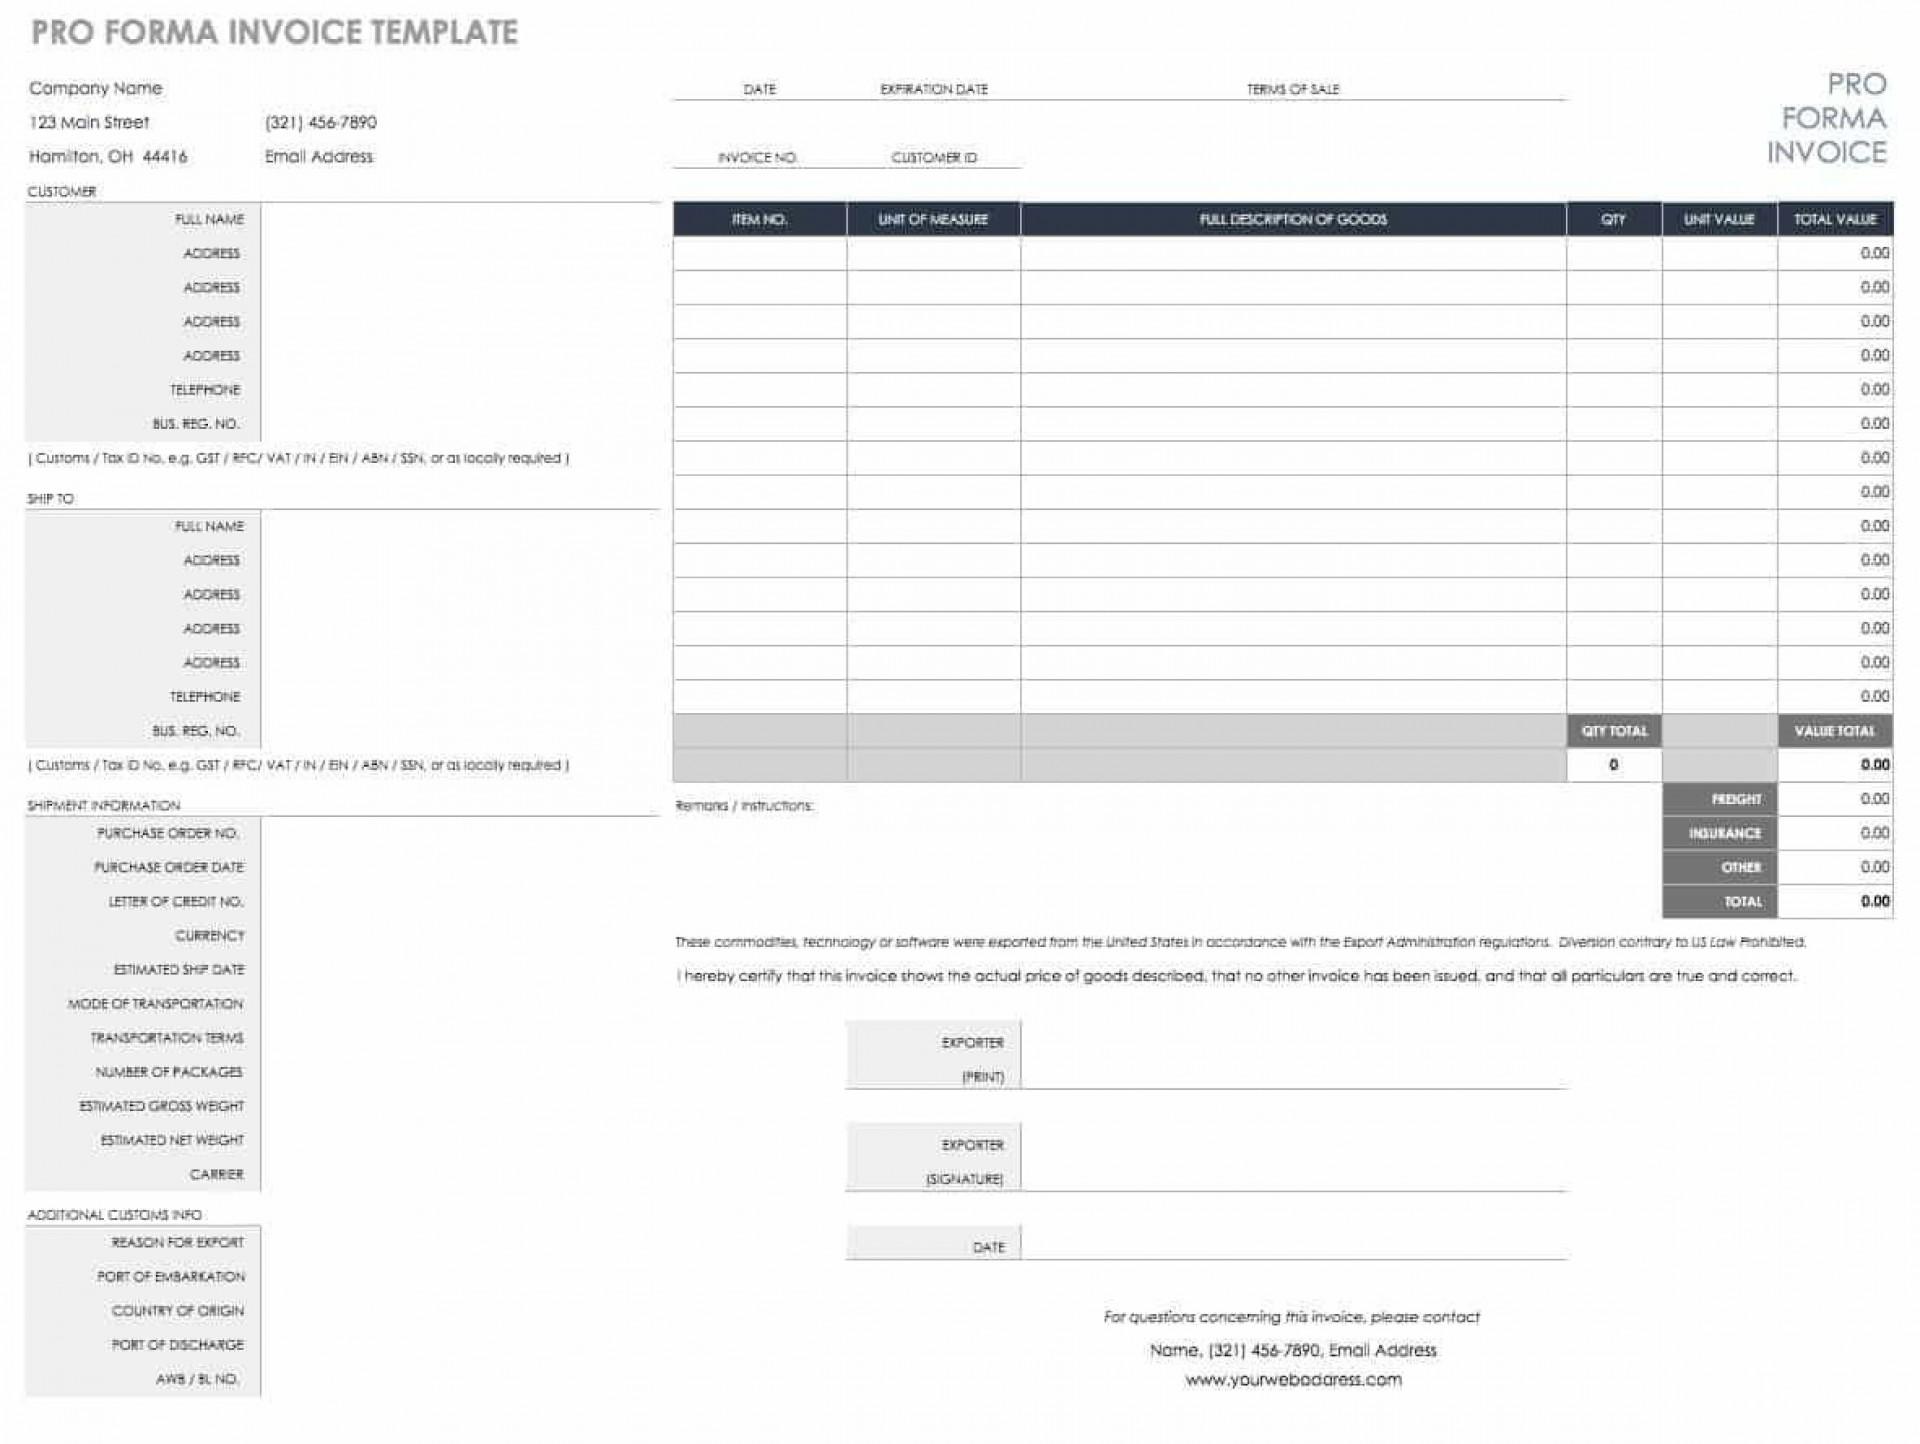 009 Impressive Free Uk Vat Invoice Template Excel High Resolution 1920